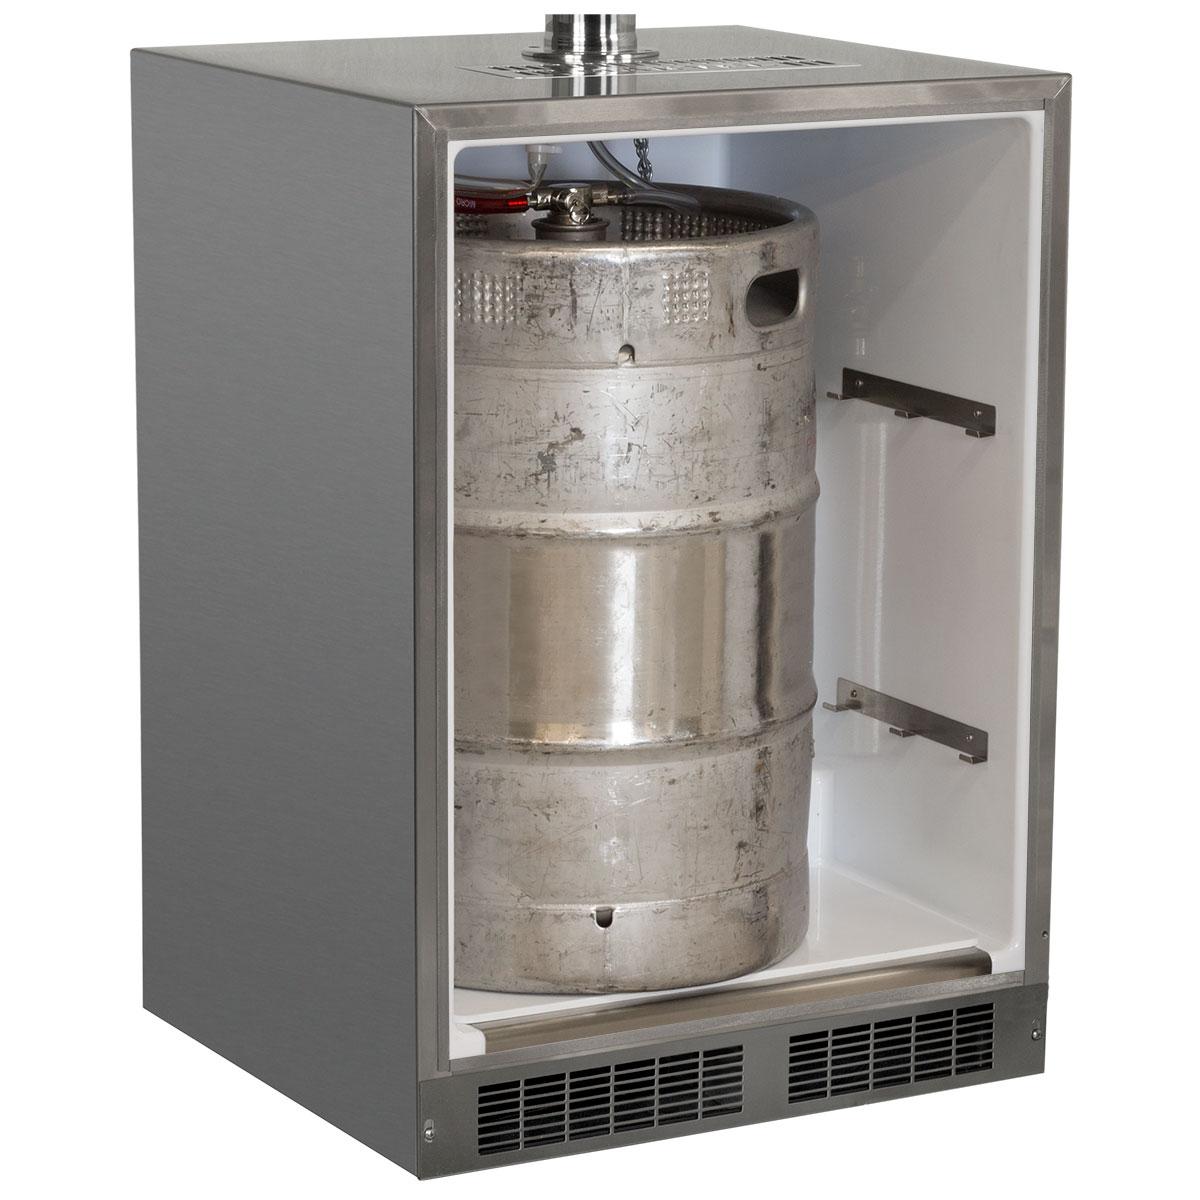 "Model: MO24BSSMRS | Marvel  24"" Outdoor Single Tap Mobile Beer Dispenser with Stainless Steel Door"